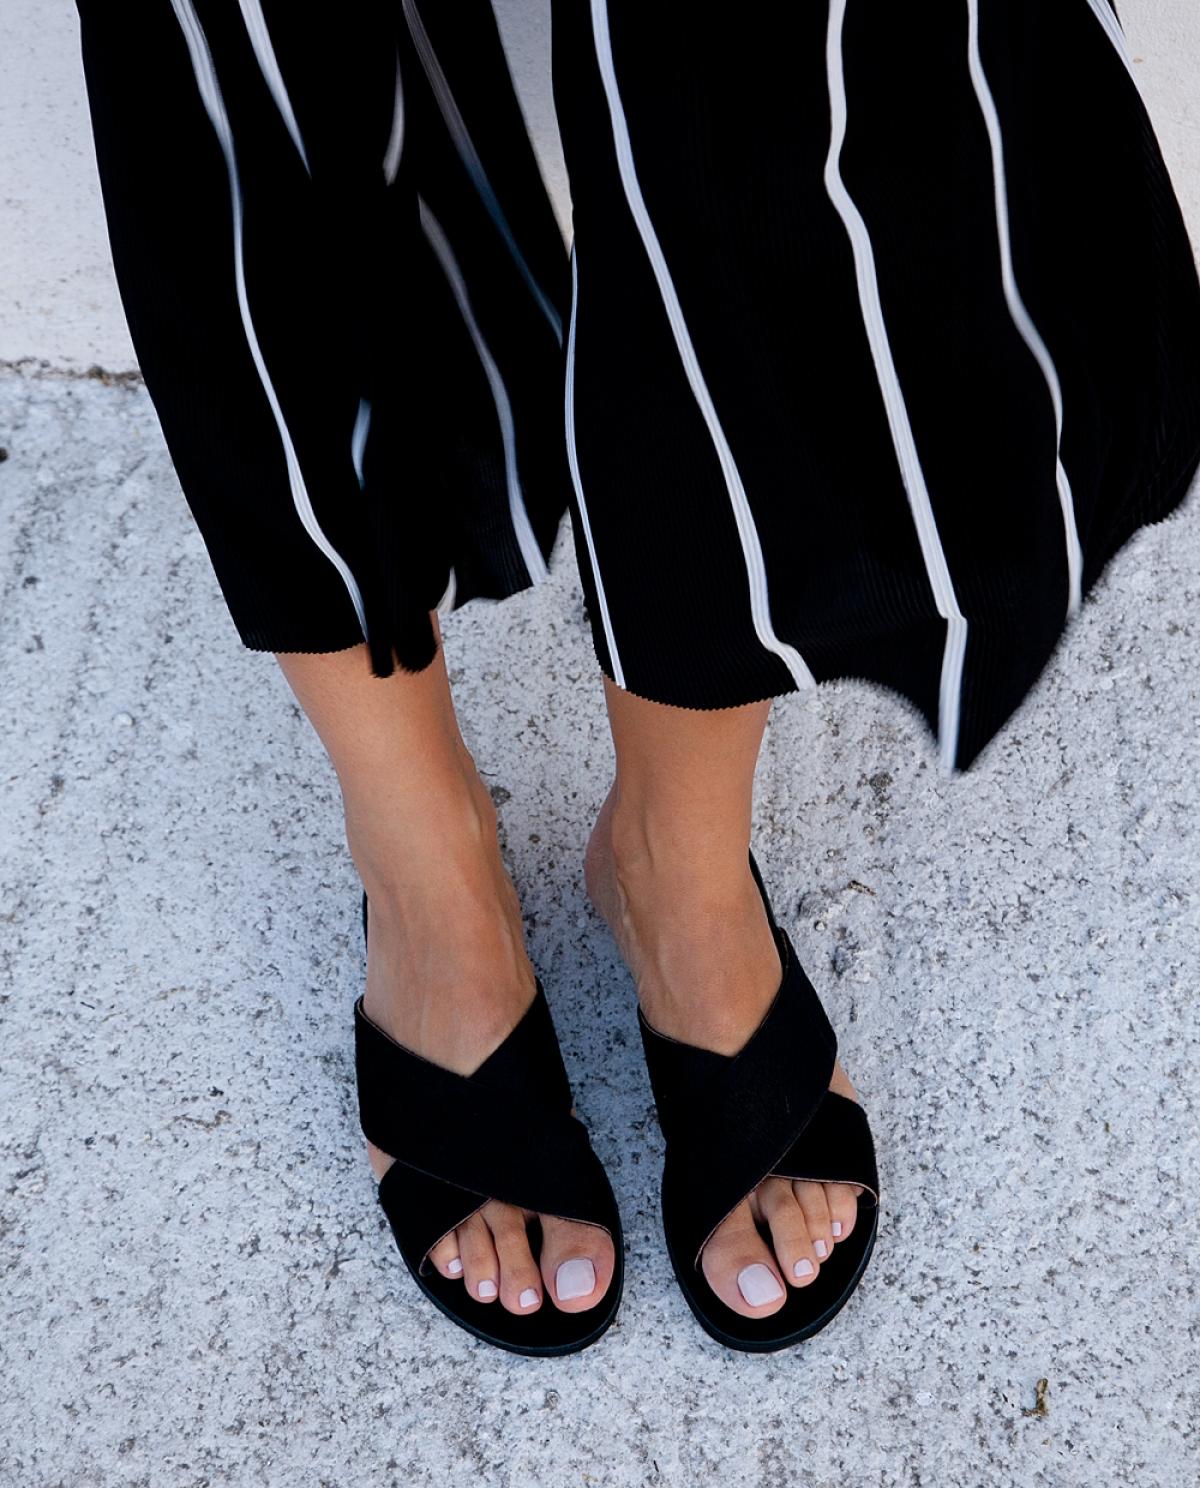 Soros Antiparos Sandals